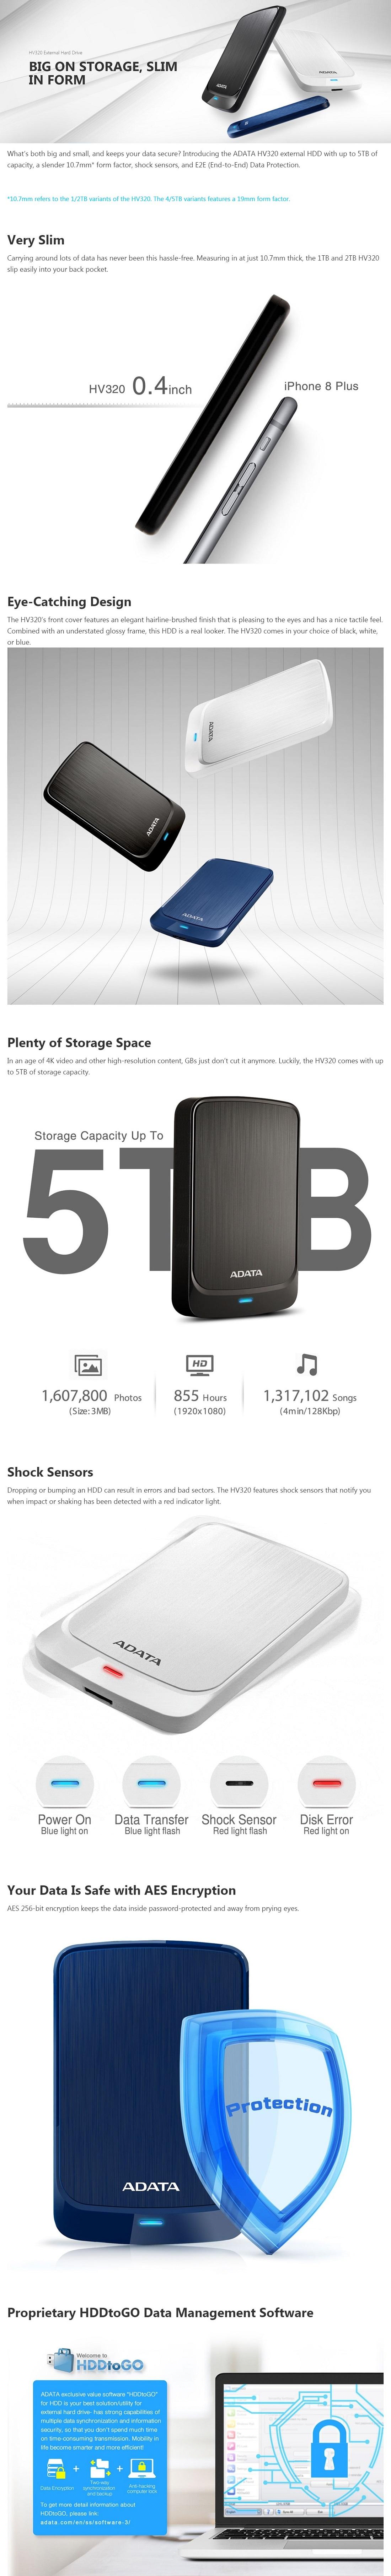 Adata HV320 1TB Slim External Hard Drive HDD Shock Protection USB 3.2 Gen1 White